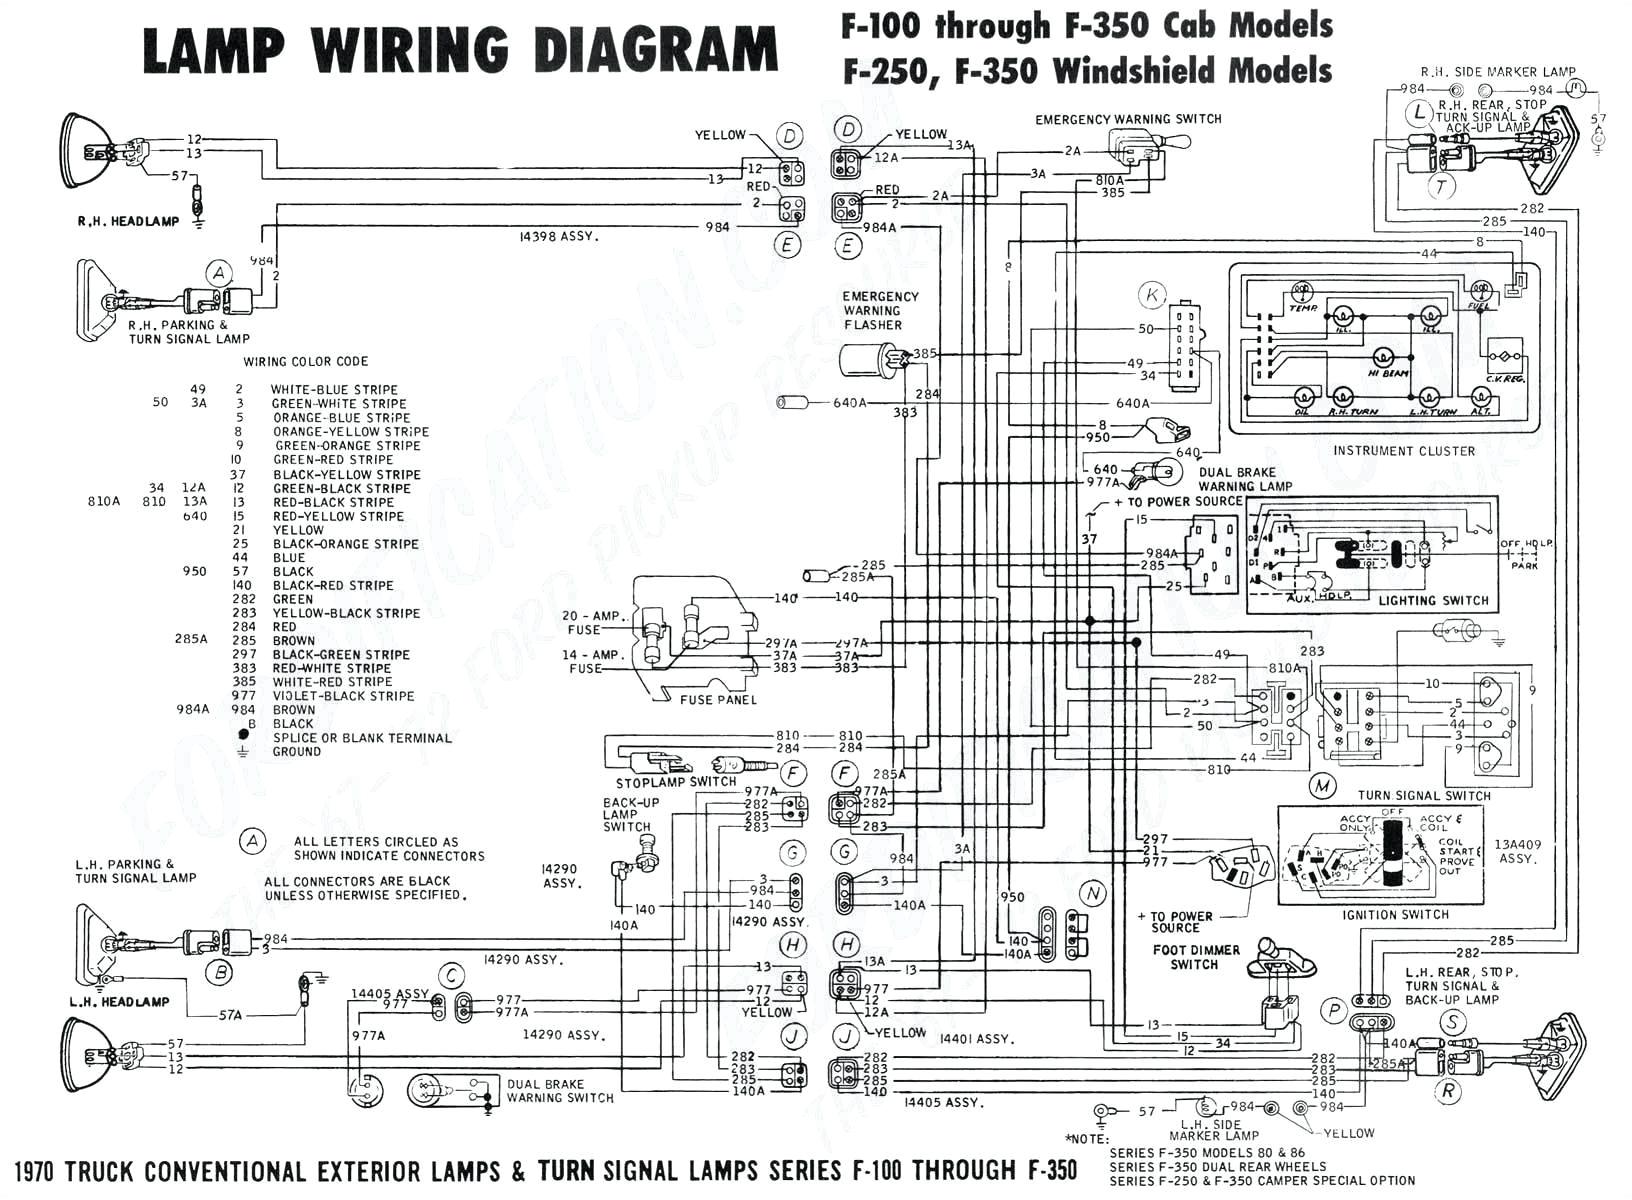 trans wiring diagram 2007 dodge 350 wiring diagram sheet 08 dodge ram wiring diagram wiring diagram